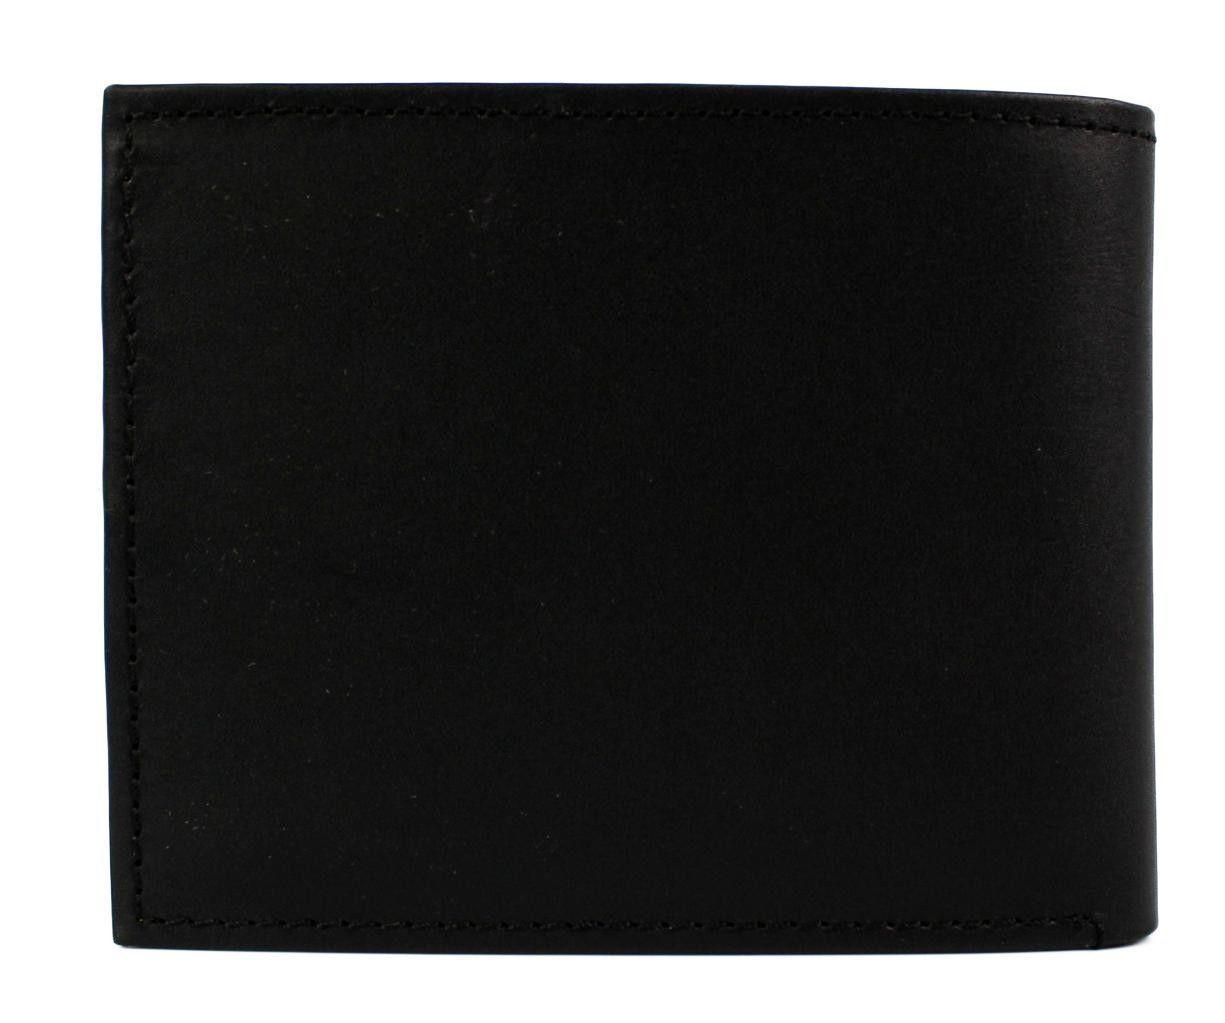 Tommy-Hilfiger-Men-039-s-Premium-Leather-Credit-Card-ID-Wallet-Passcase-31TL22X046 thumbnail 9